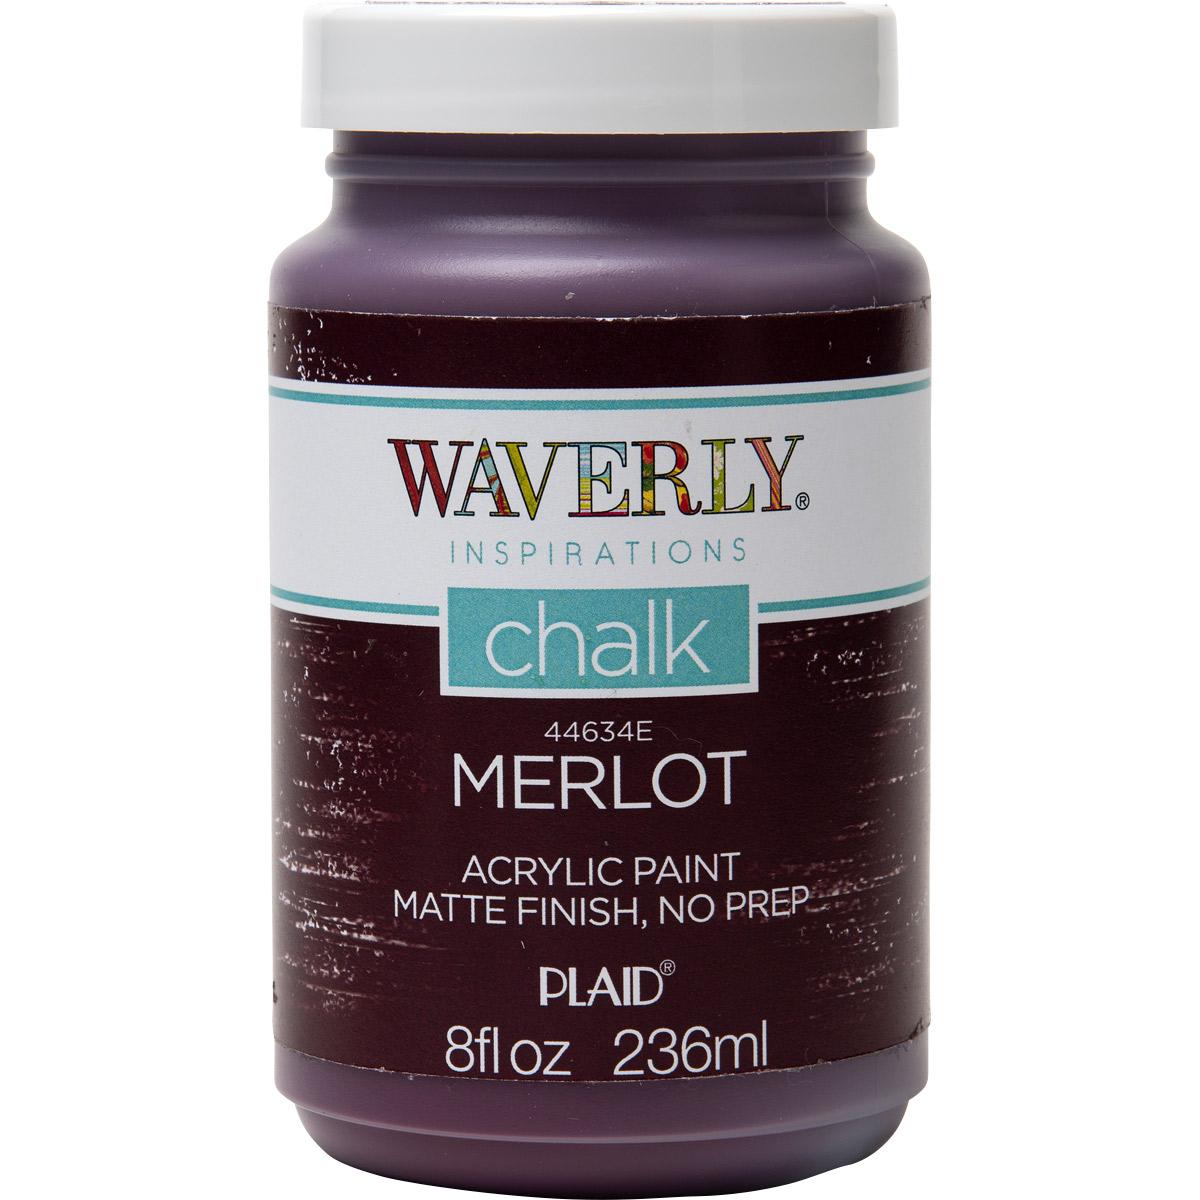 Waverly ® Inspirations Chalk Finish Acrylic Paint - Merlot, 8 oz.